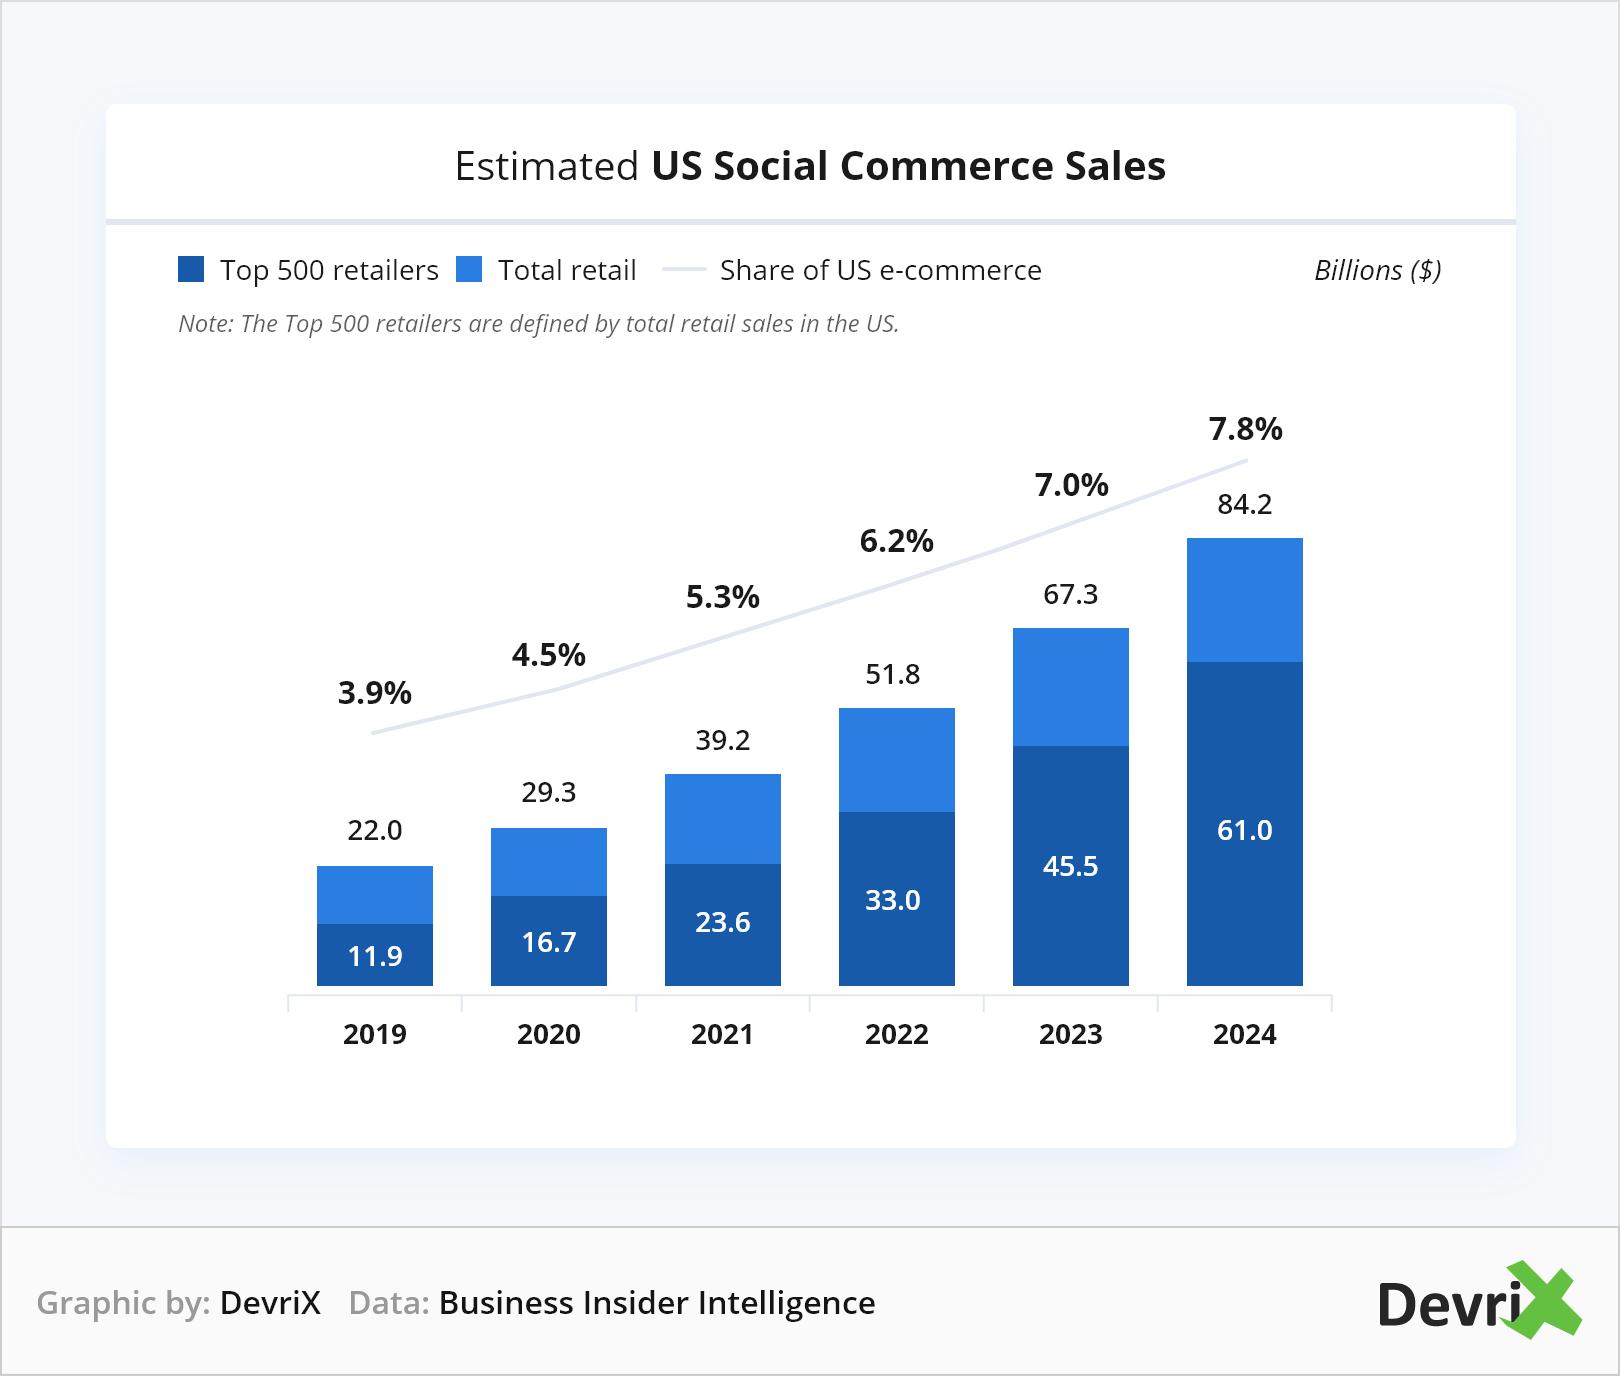 Estimated US Social Commerce Sales